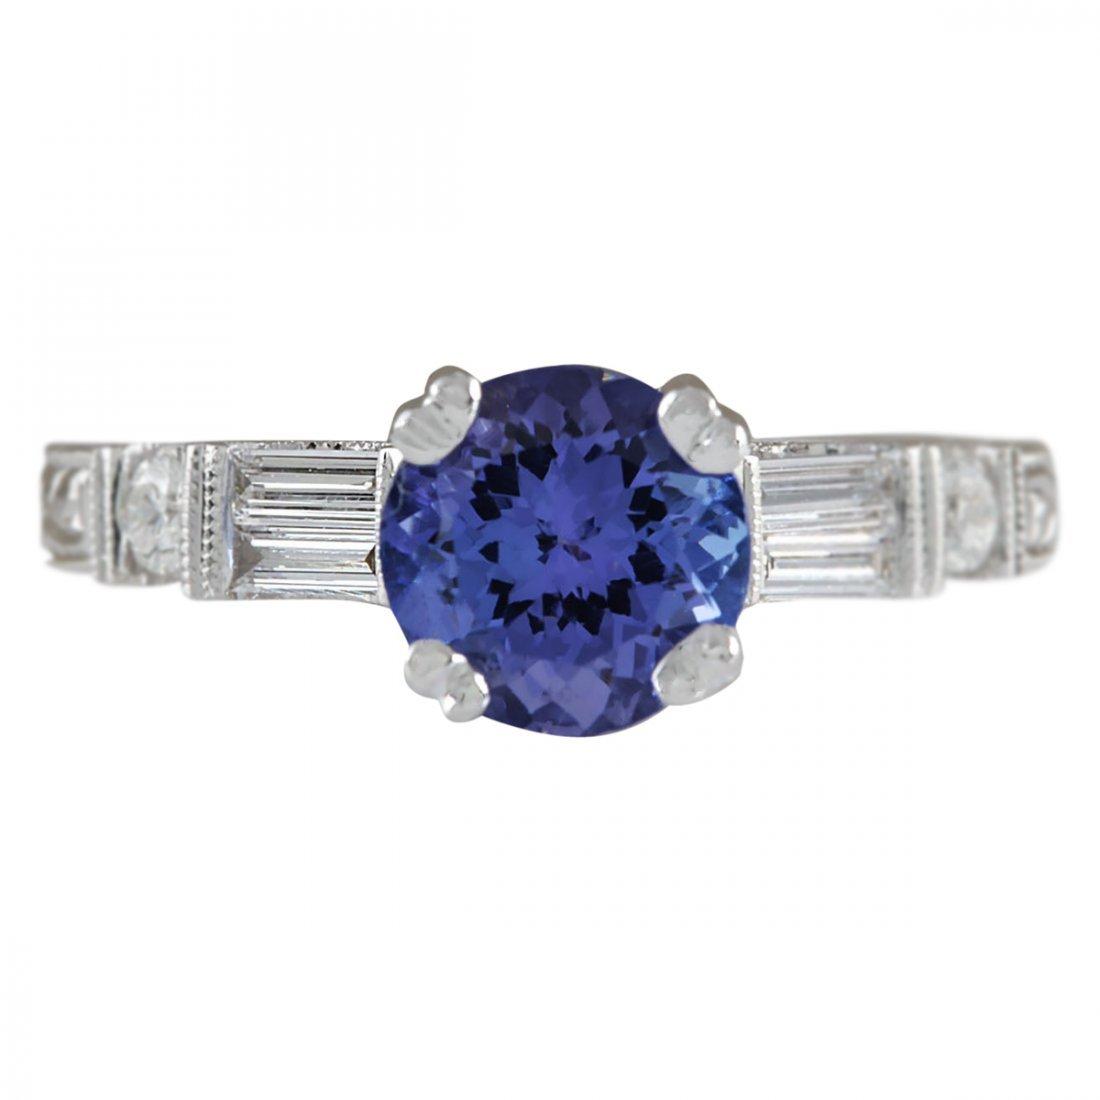 2.36 CTW Natural Blue Tanzanite And Diamond Ring 14K